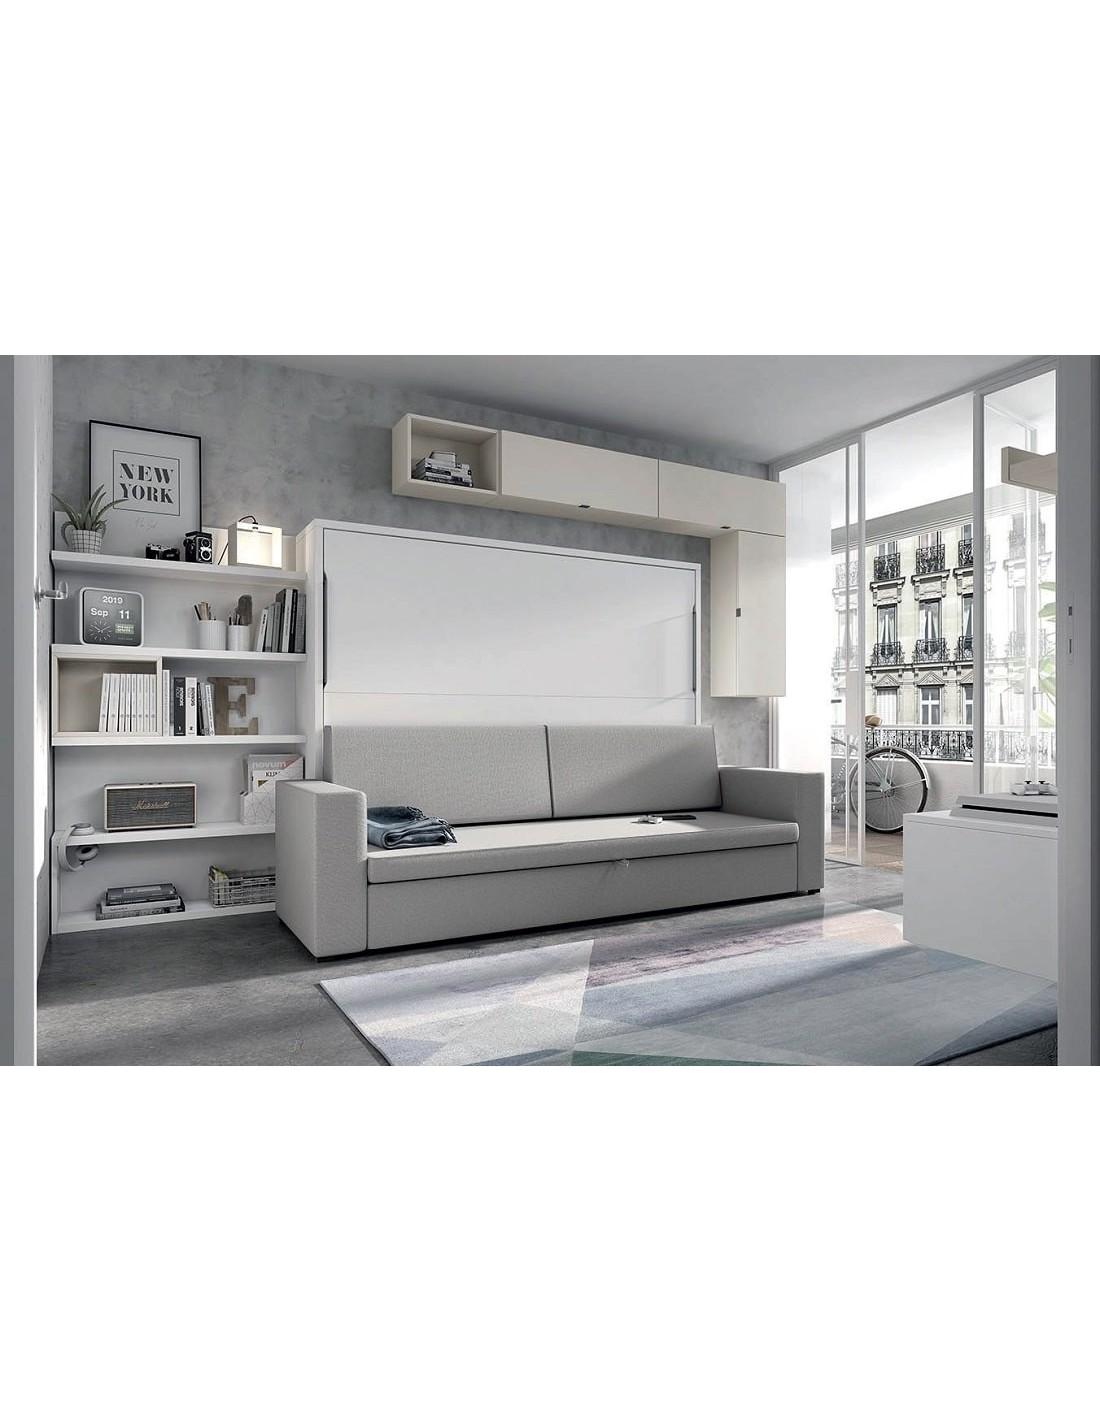 cama horizontal simple con sofá canapé